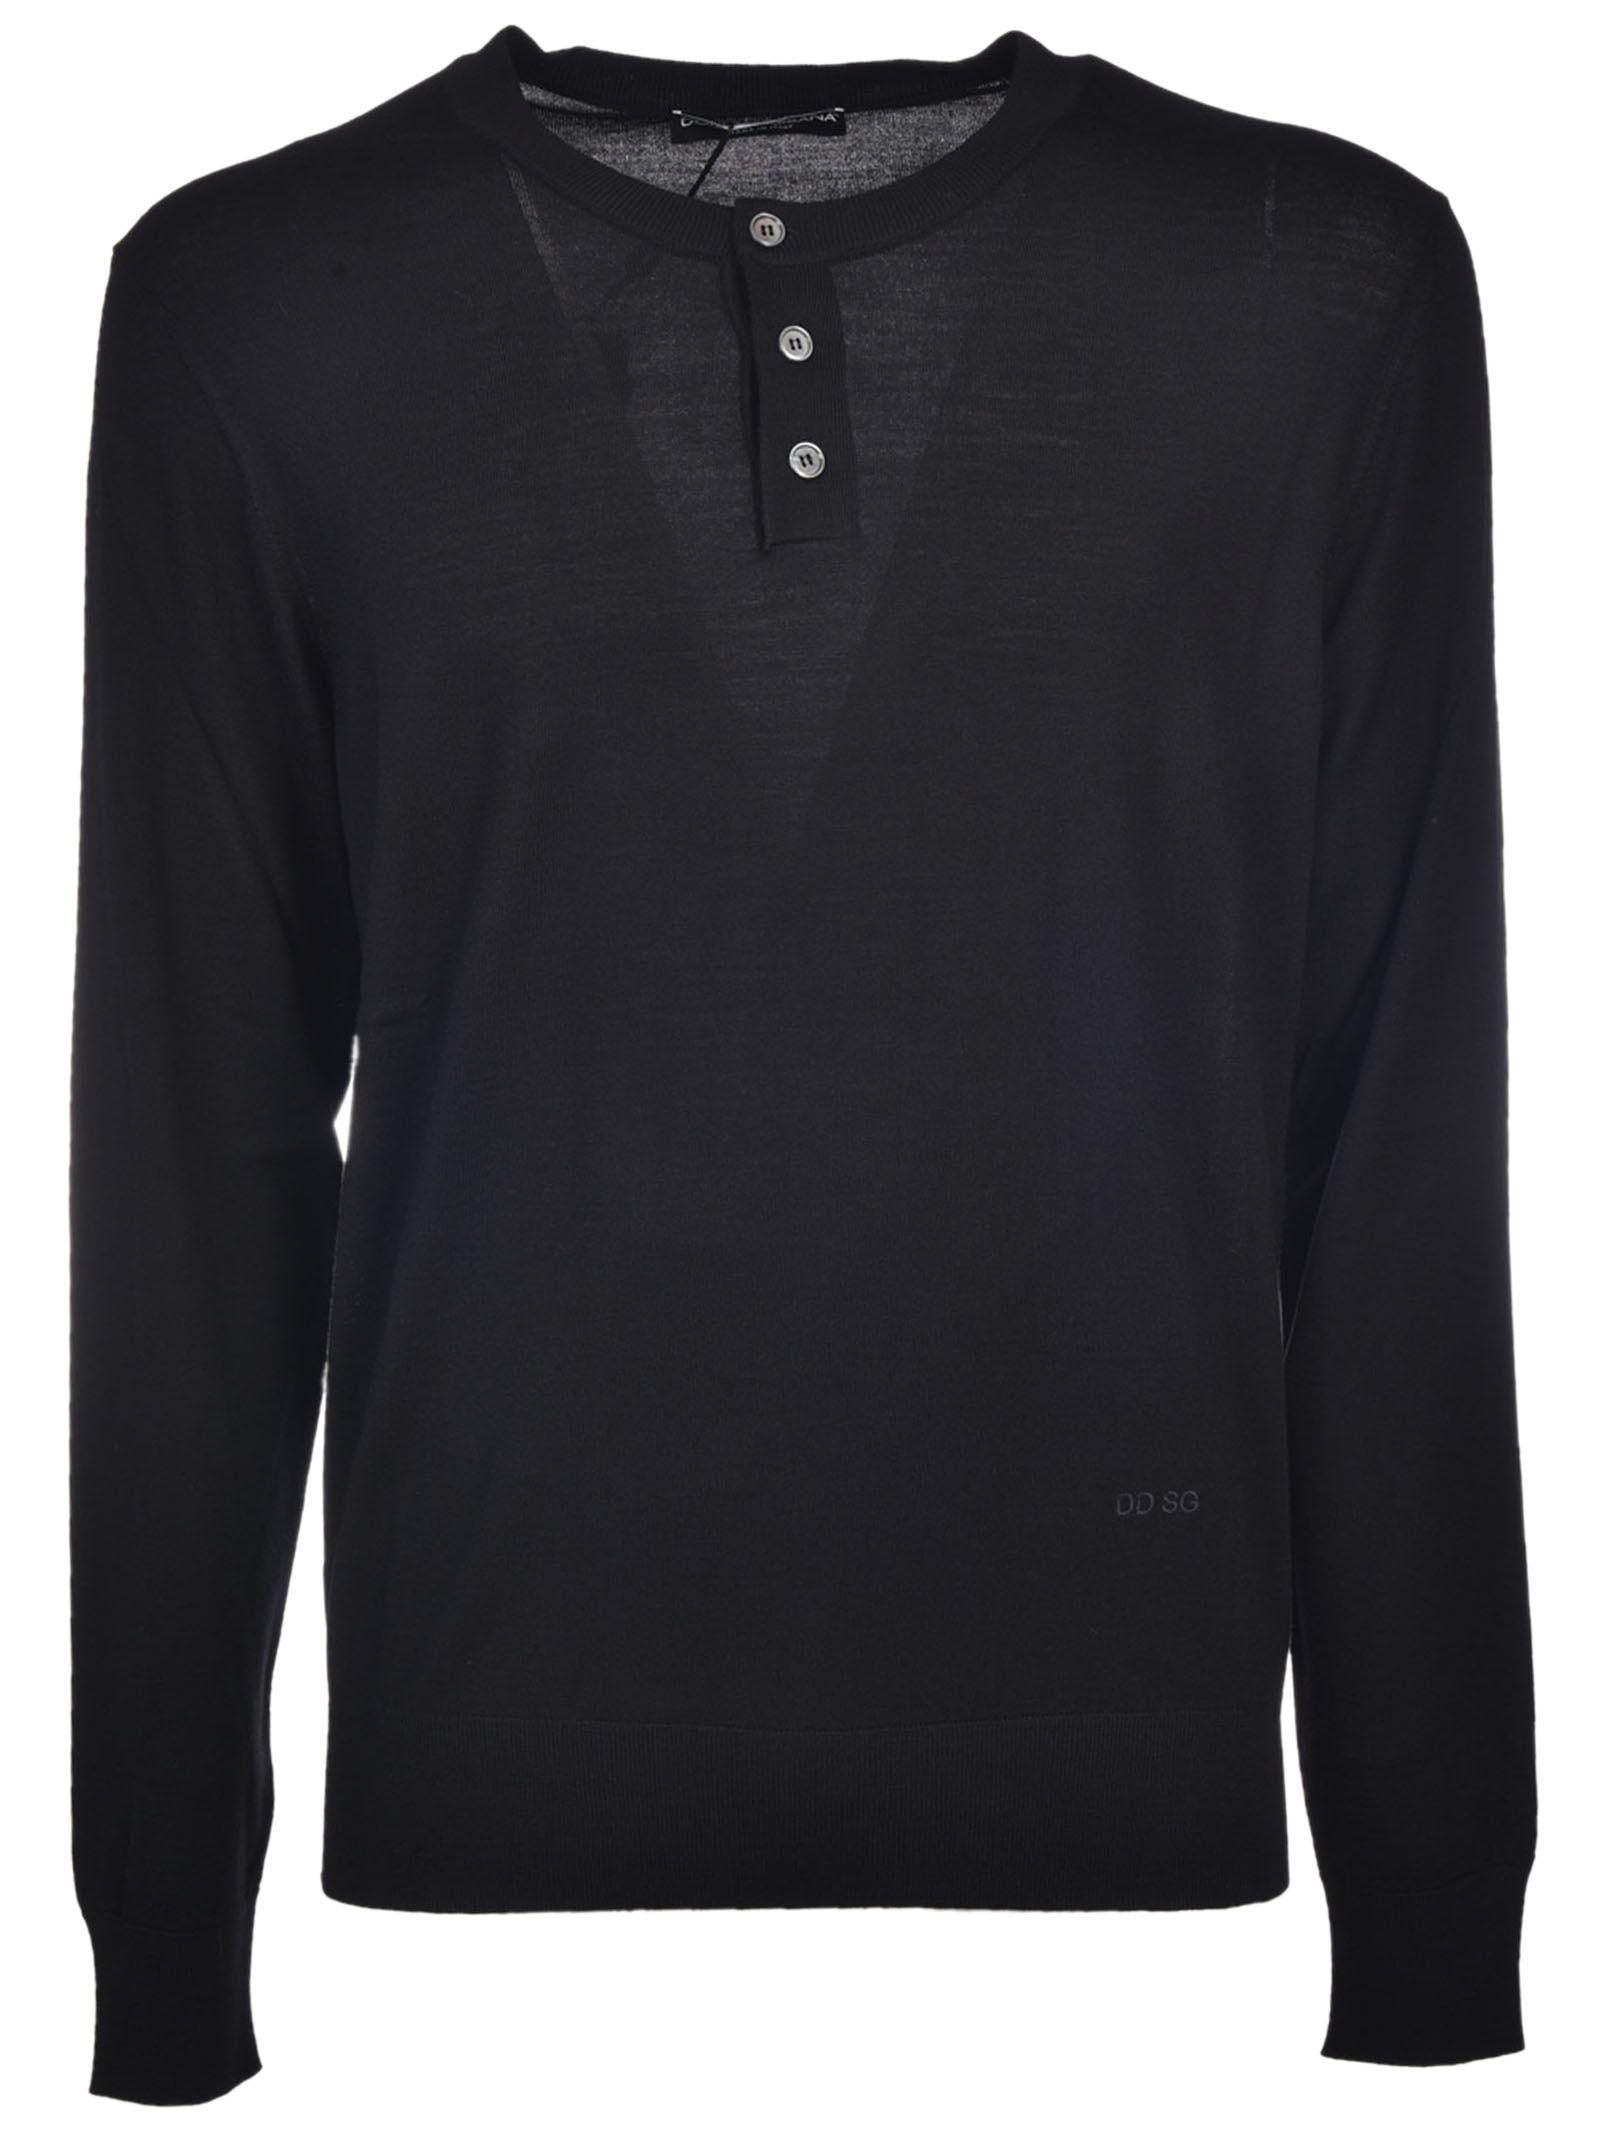 Dolce & Gabbana Buttoned Sweater